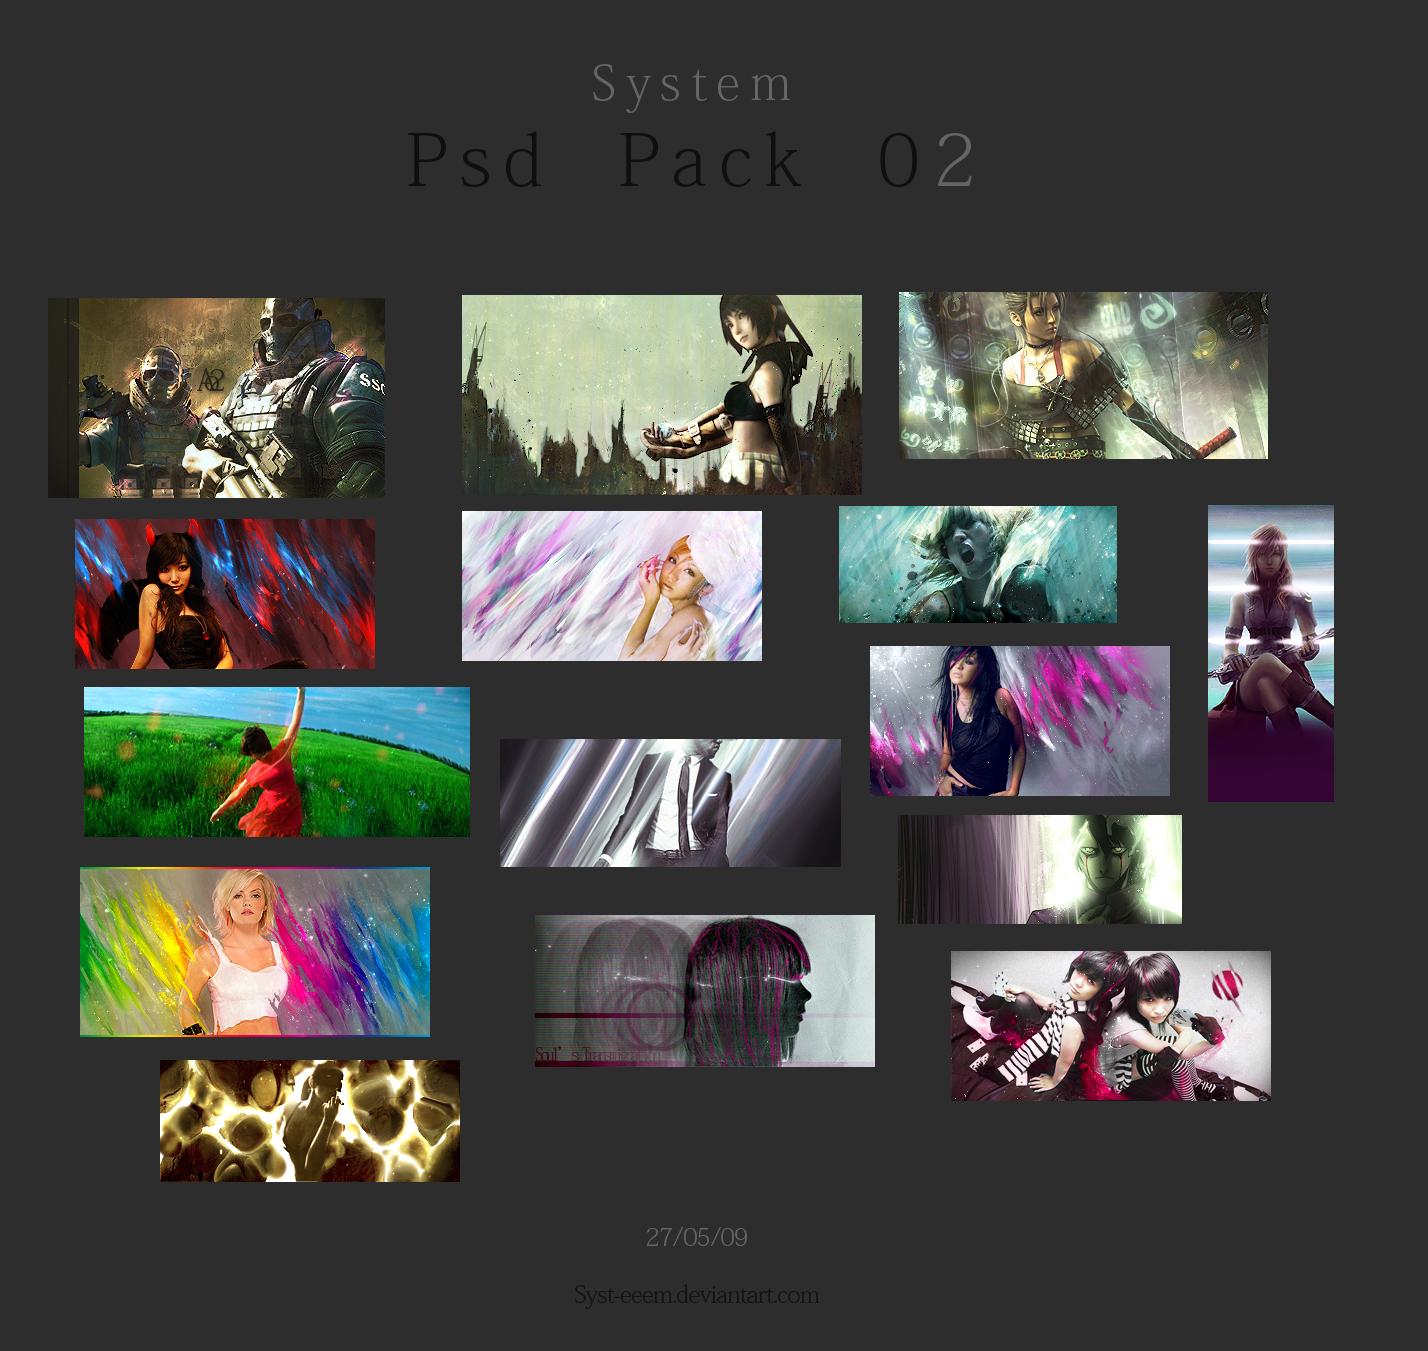 Psd Pack # 2 by Syst-eeem Psd_Pack_02_by_Syst_eeem